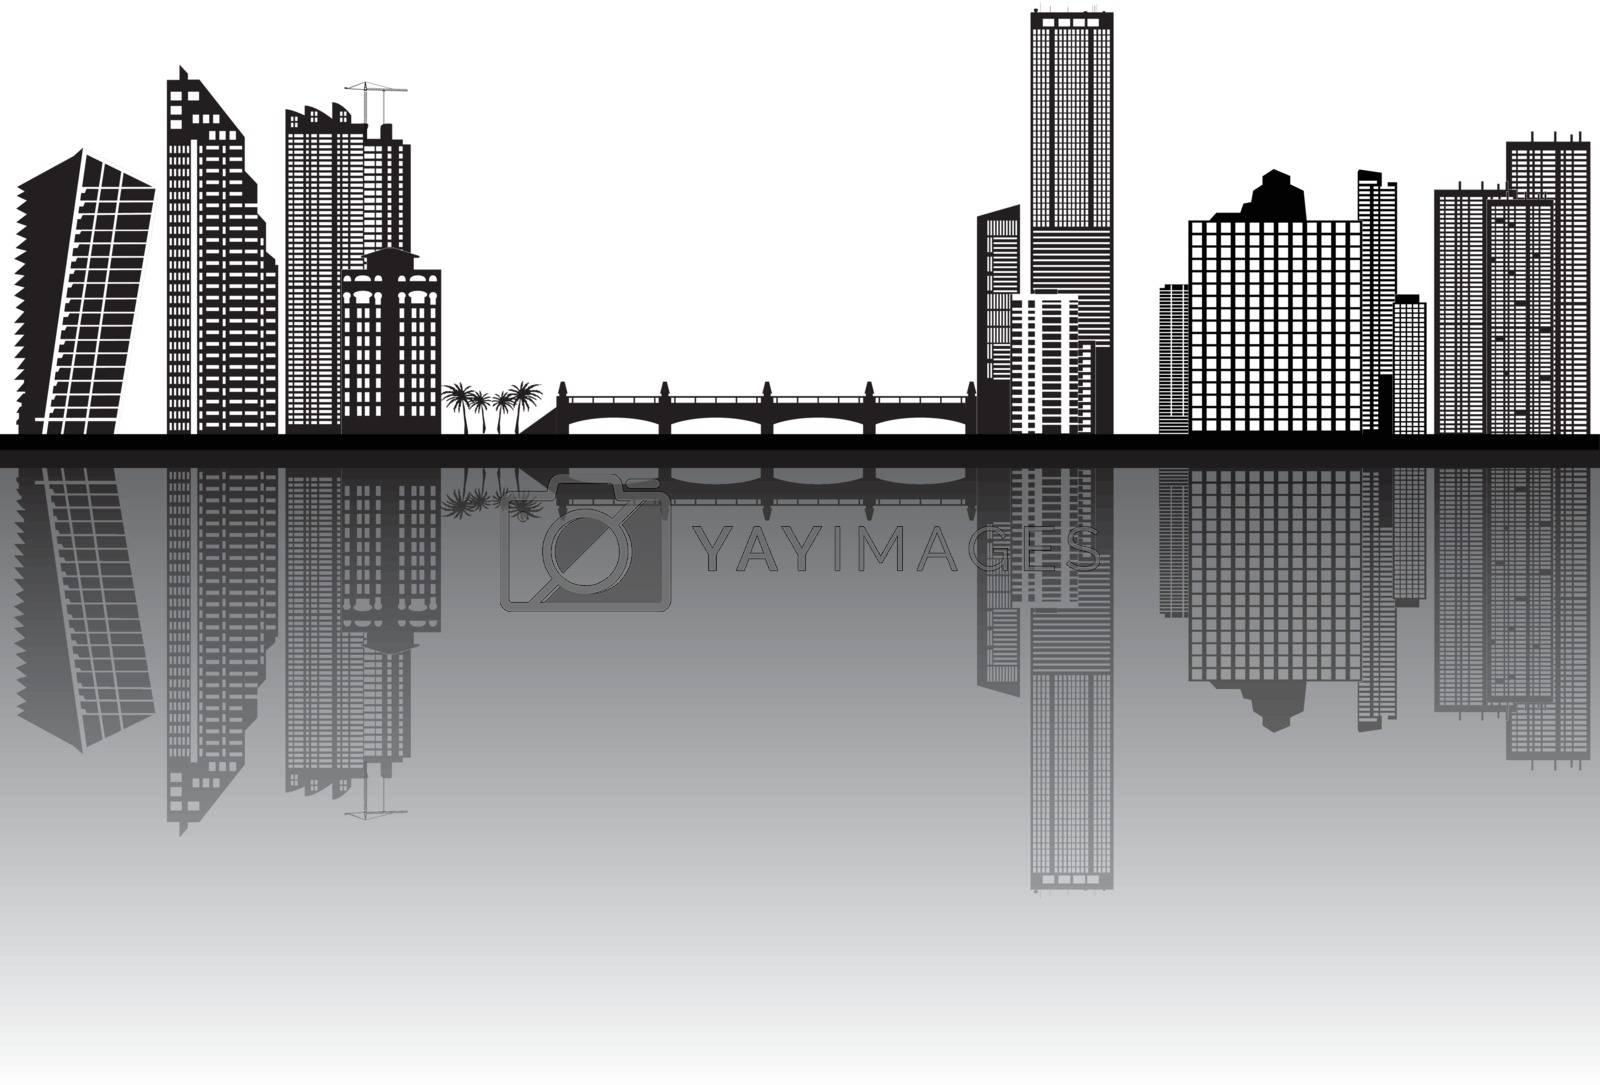 miami skyline by compuinfoto